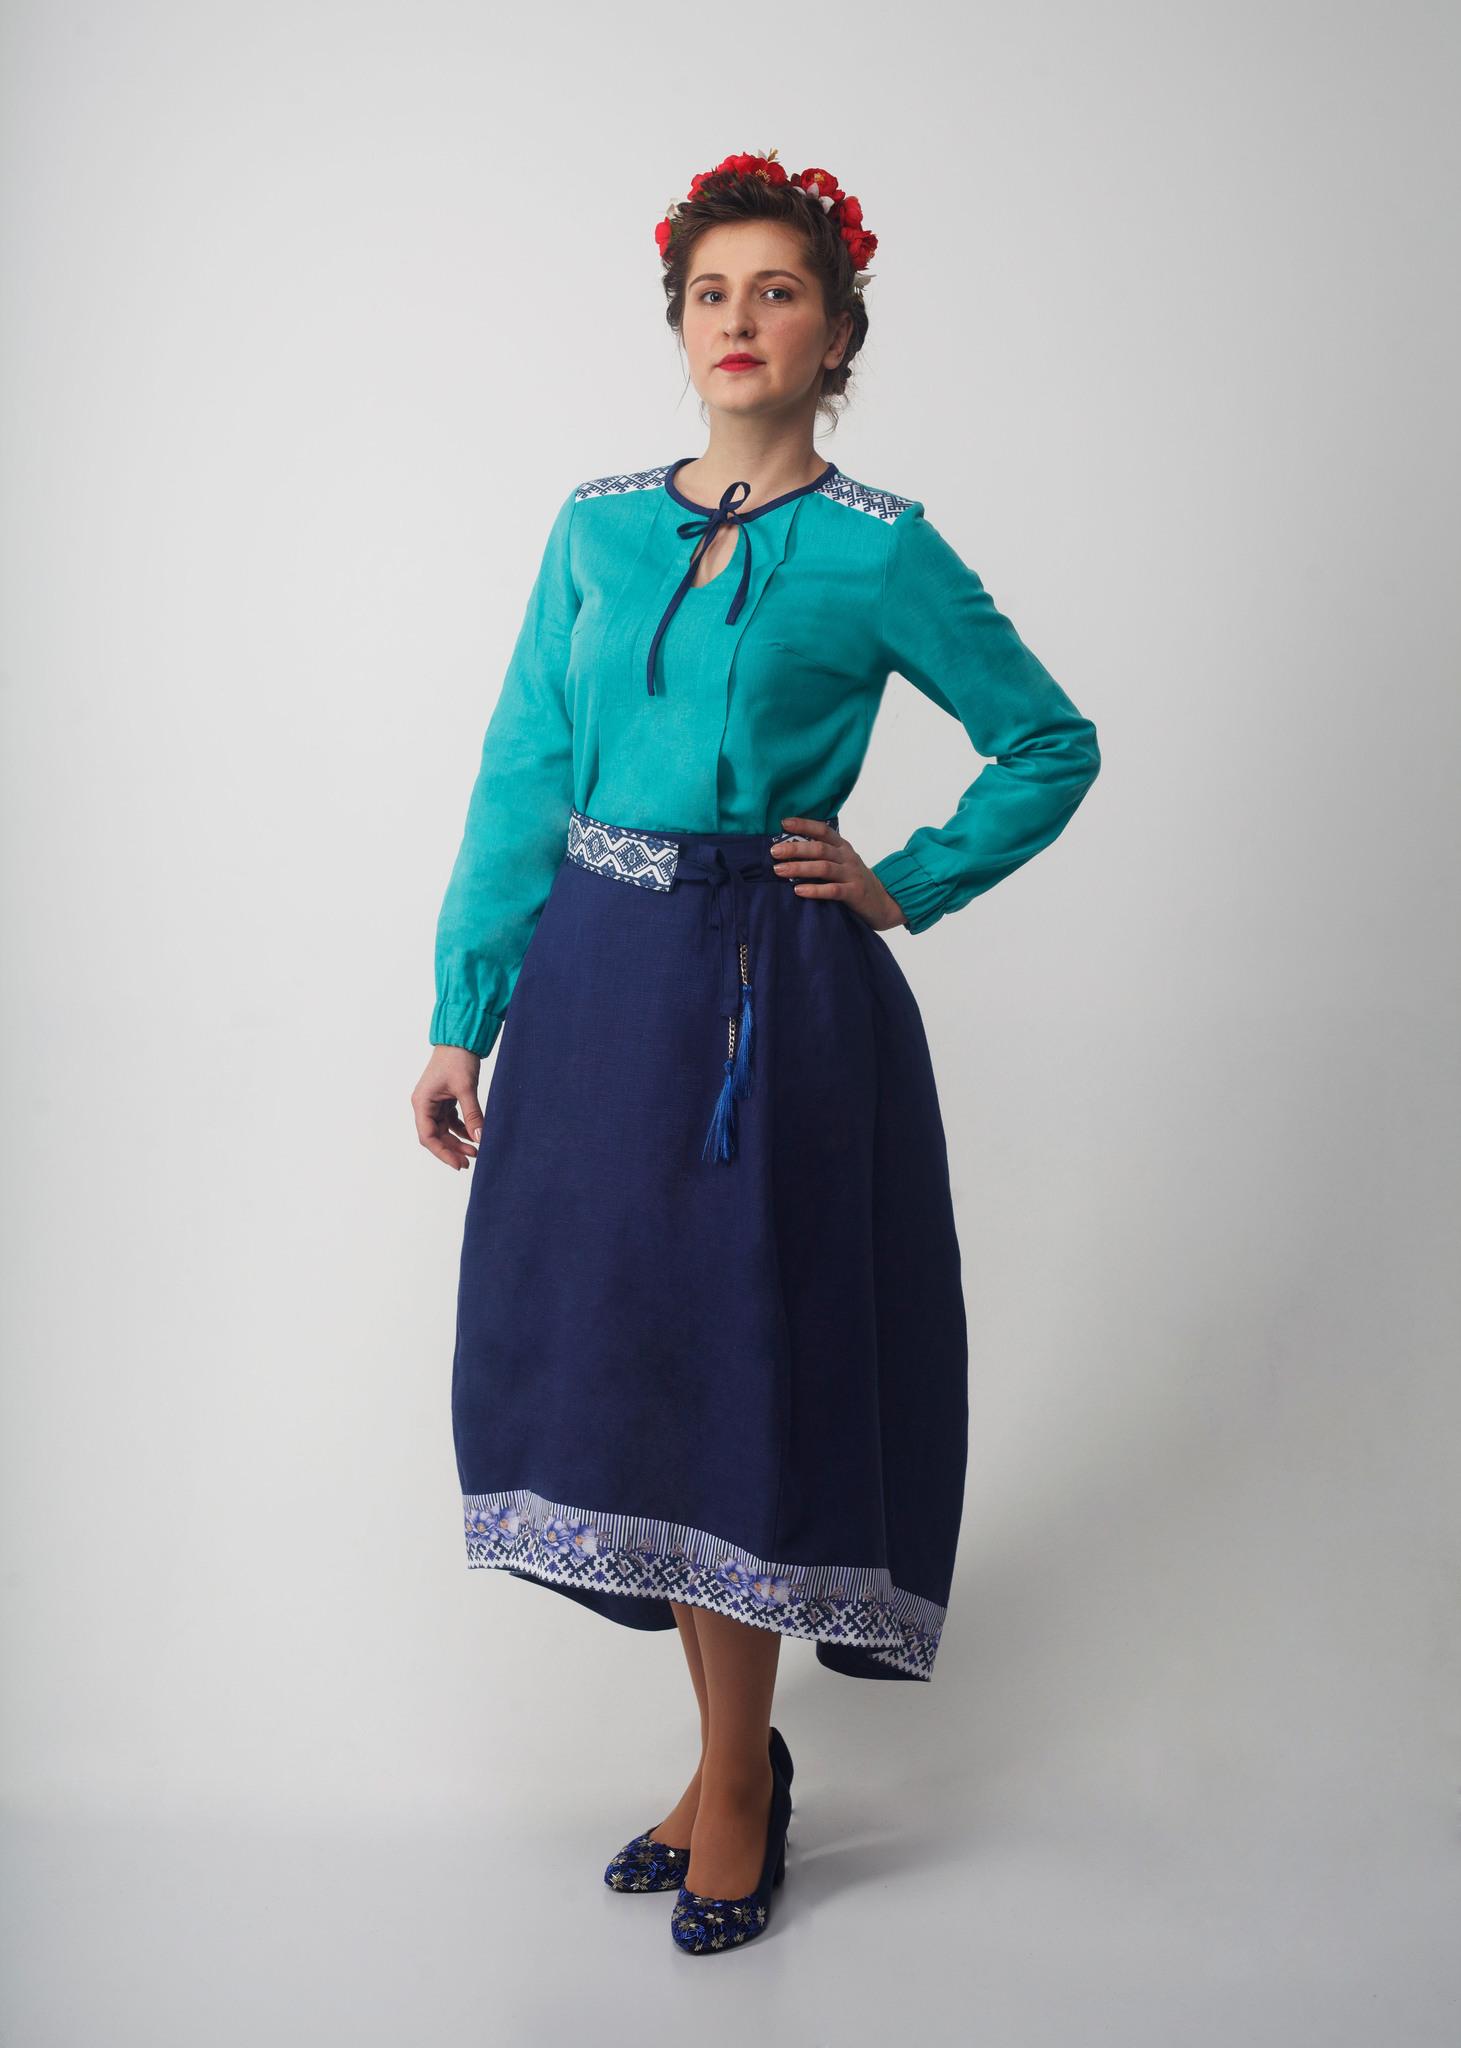 Юбка льняная Славянка 01 с блузкой Бирюза